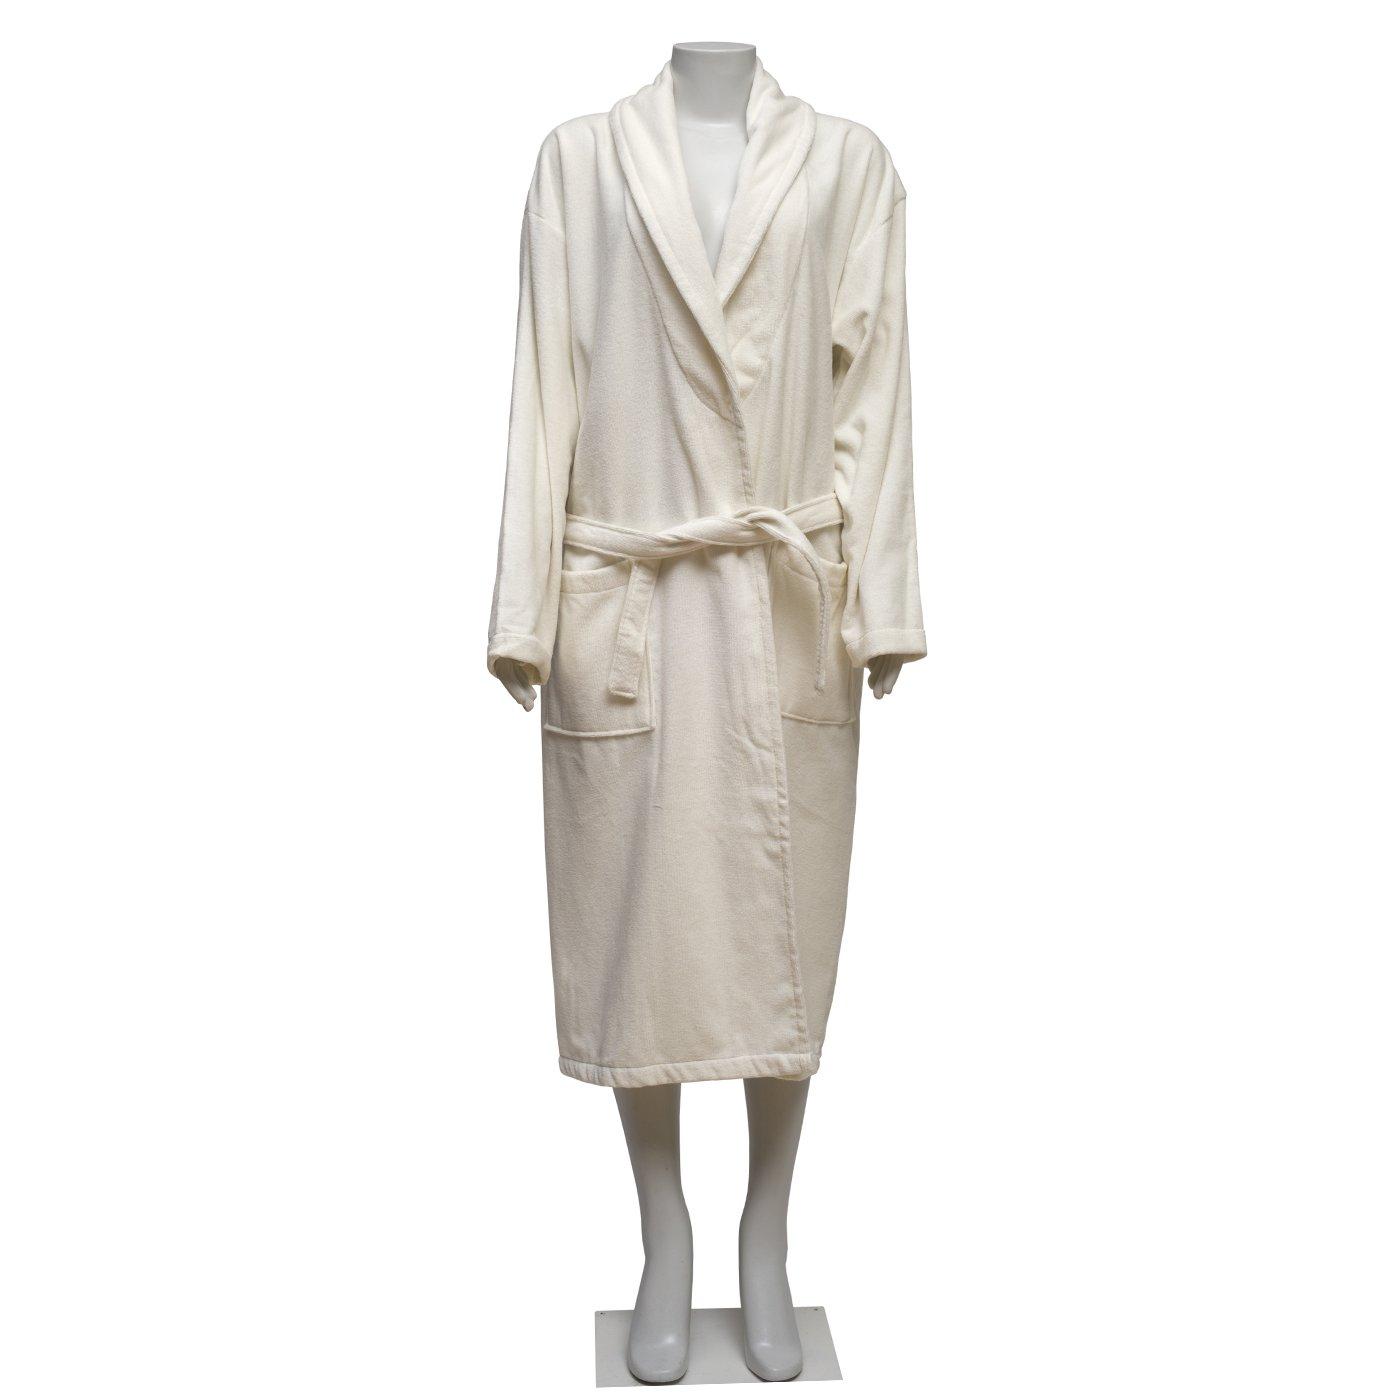 100% Turkish Cotton Velvet Extra Plush Bathrobe Set, Large Bath Towel, Hair Towel Unisex Terry Bathrobe Set - Moisture Wicking and Odor Resistant (Light Cream)